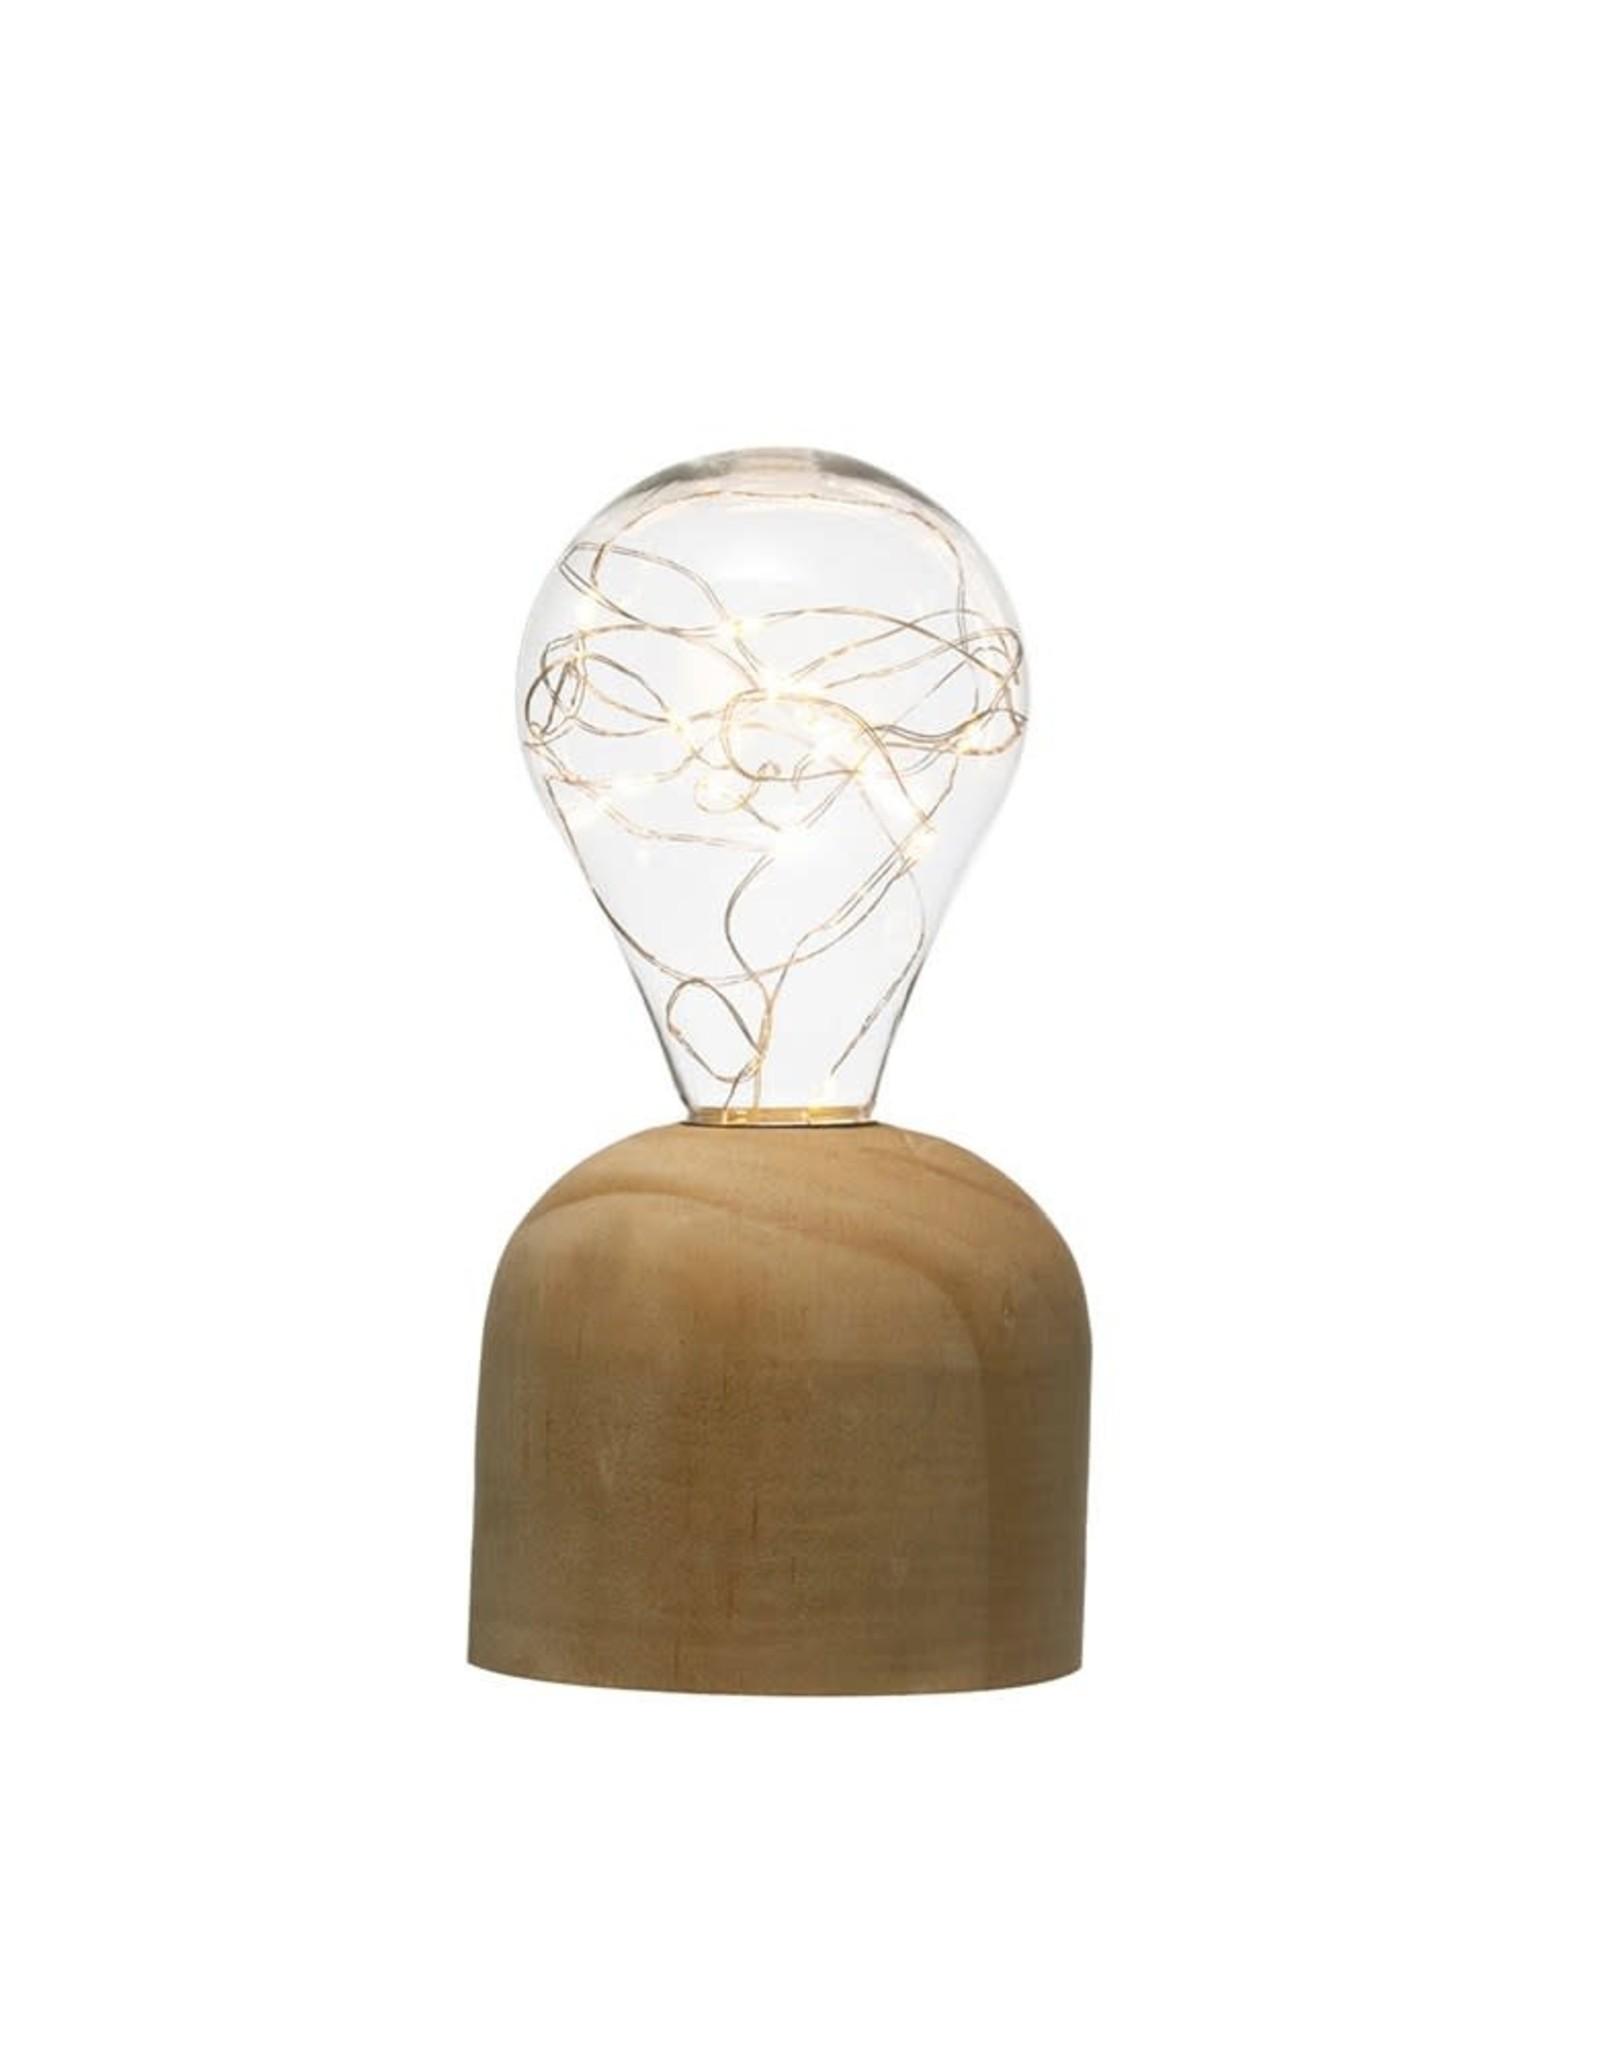 Wink Wooden Base Bulb Light